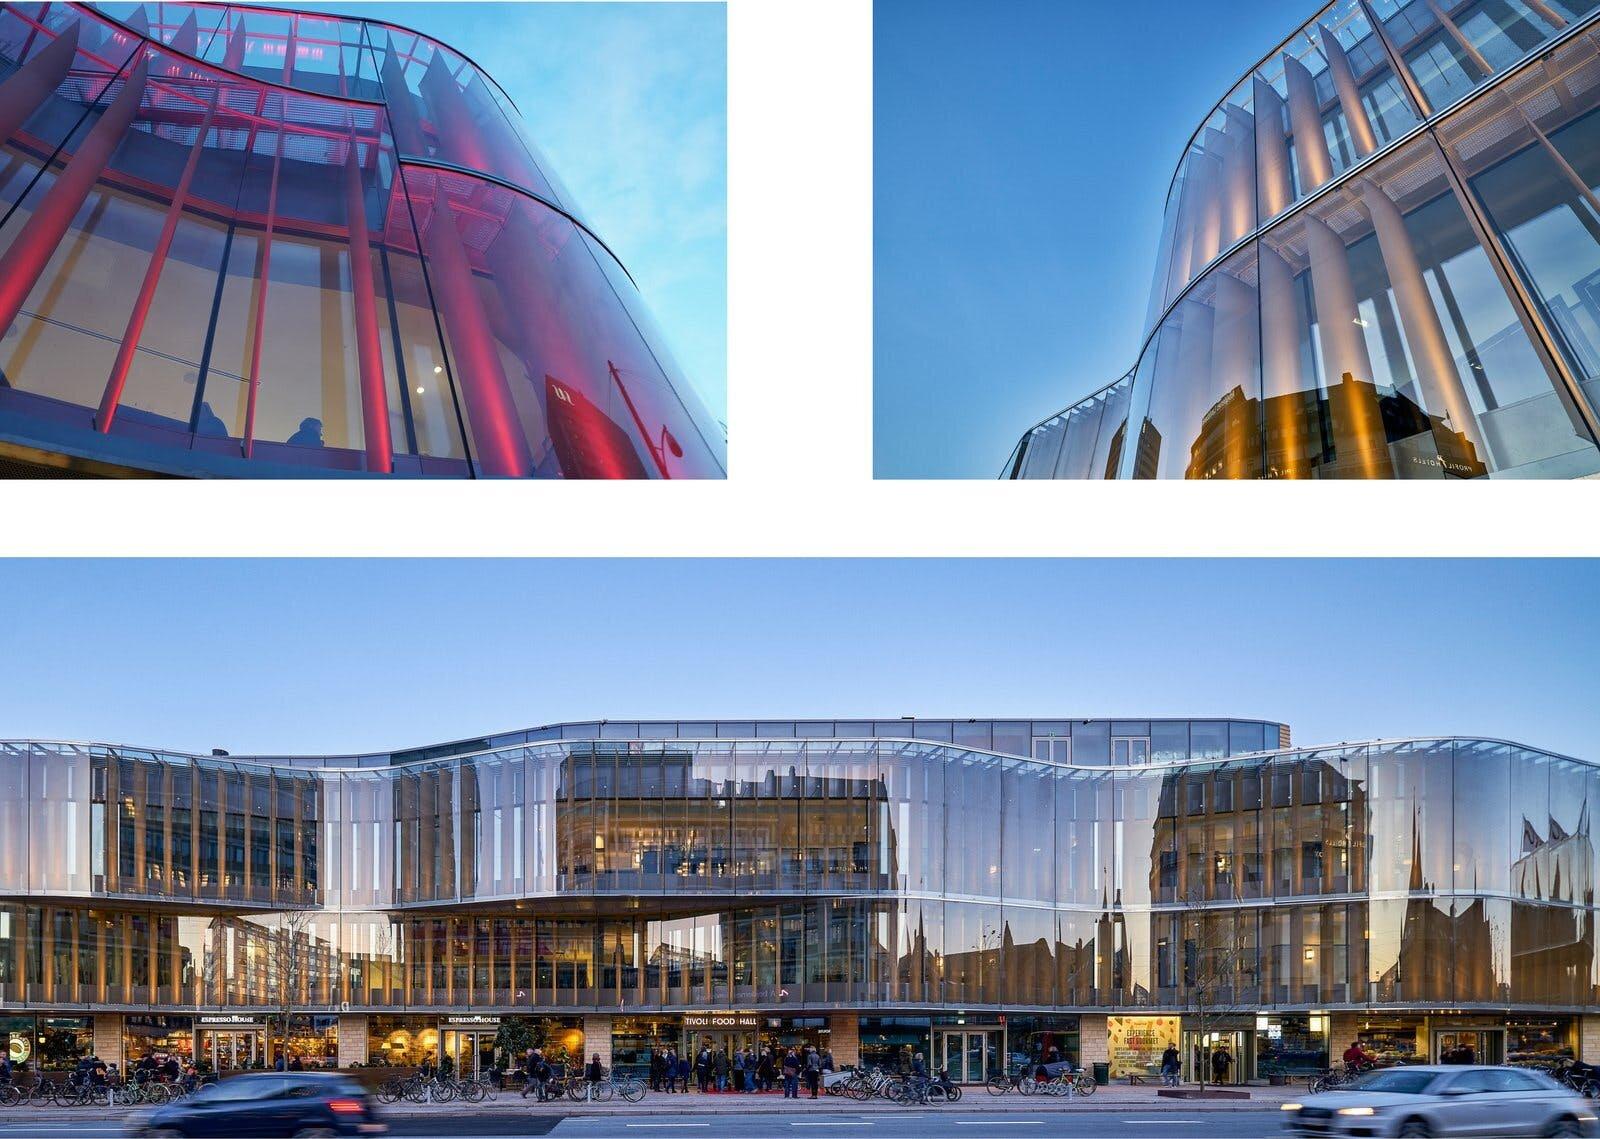 Billeder fra  Pei Cobb Freed & Partners Architects